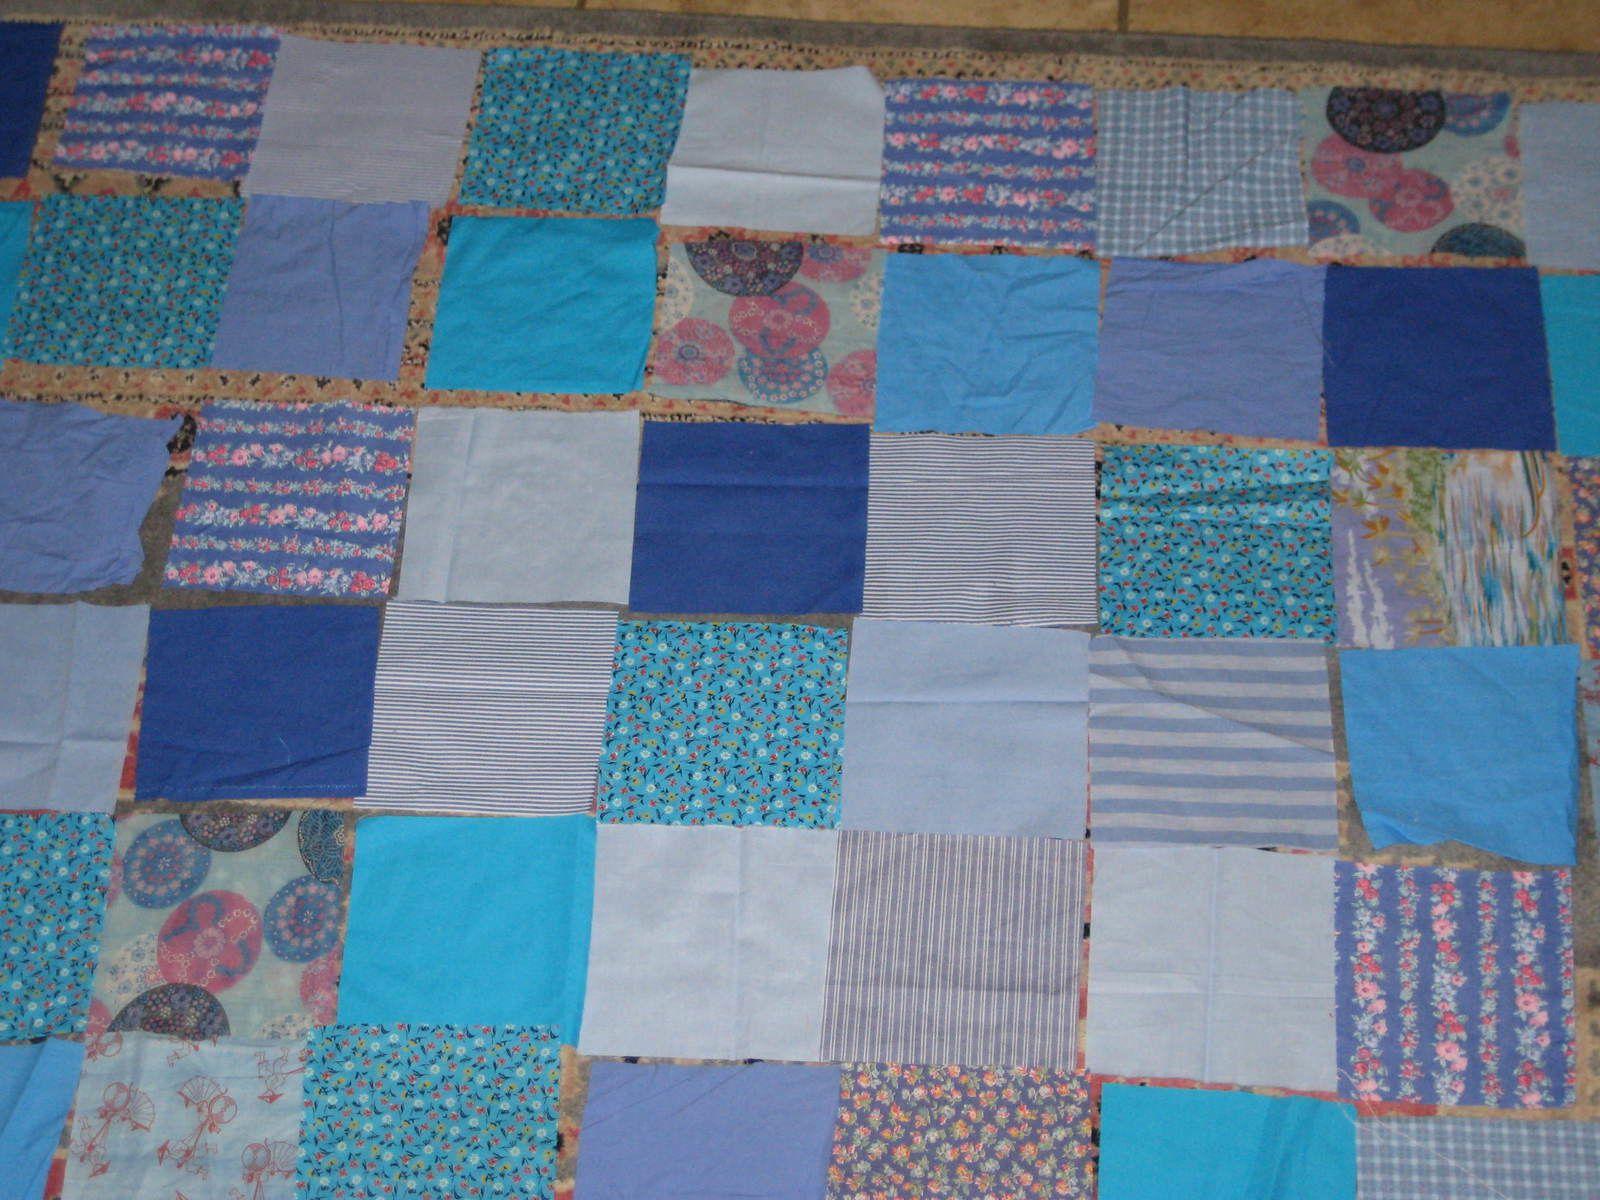 En-cours en bleu méditerranée : patchwork bleu